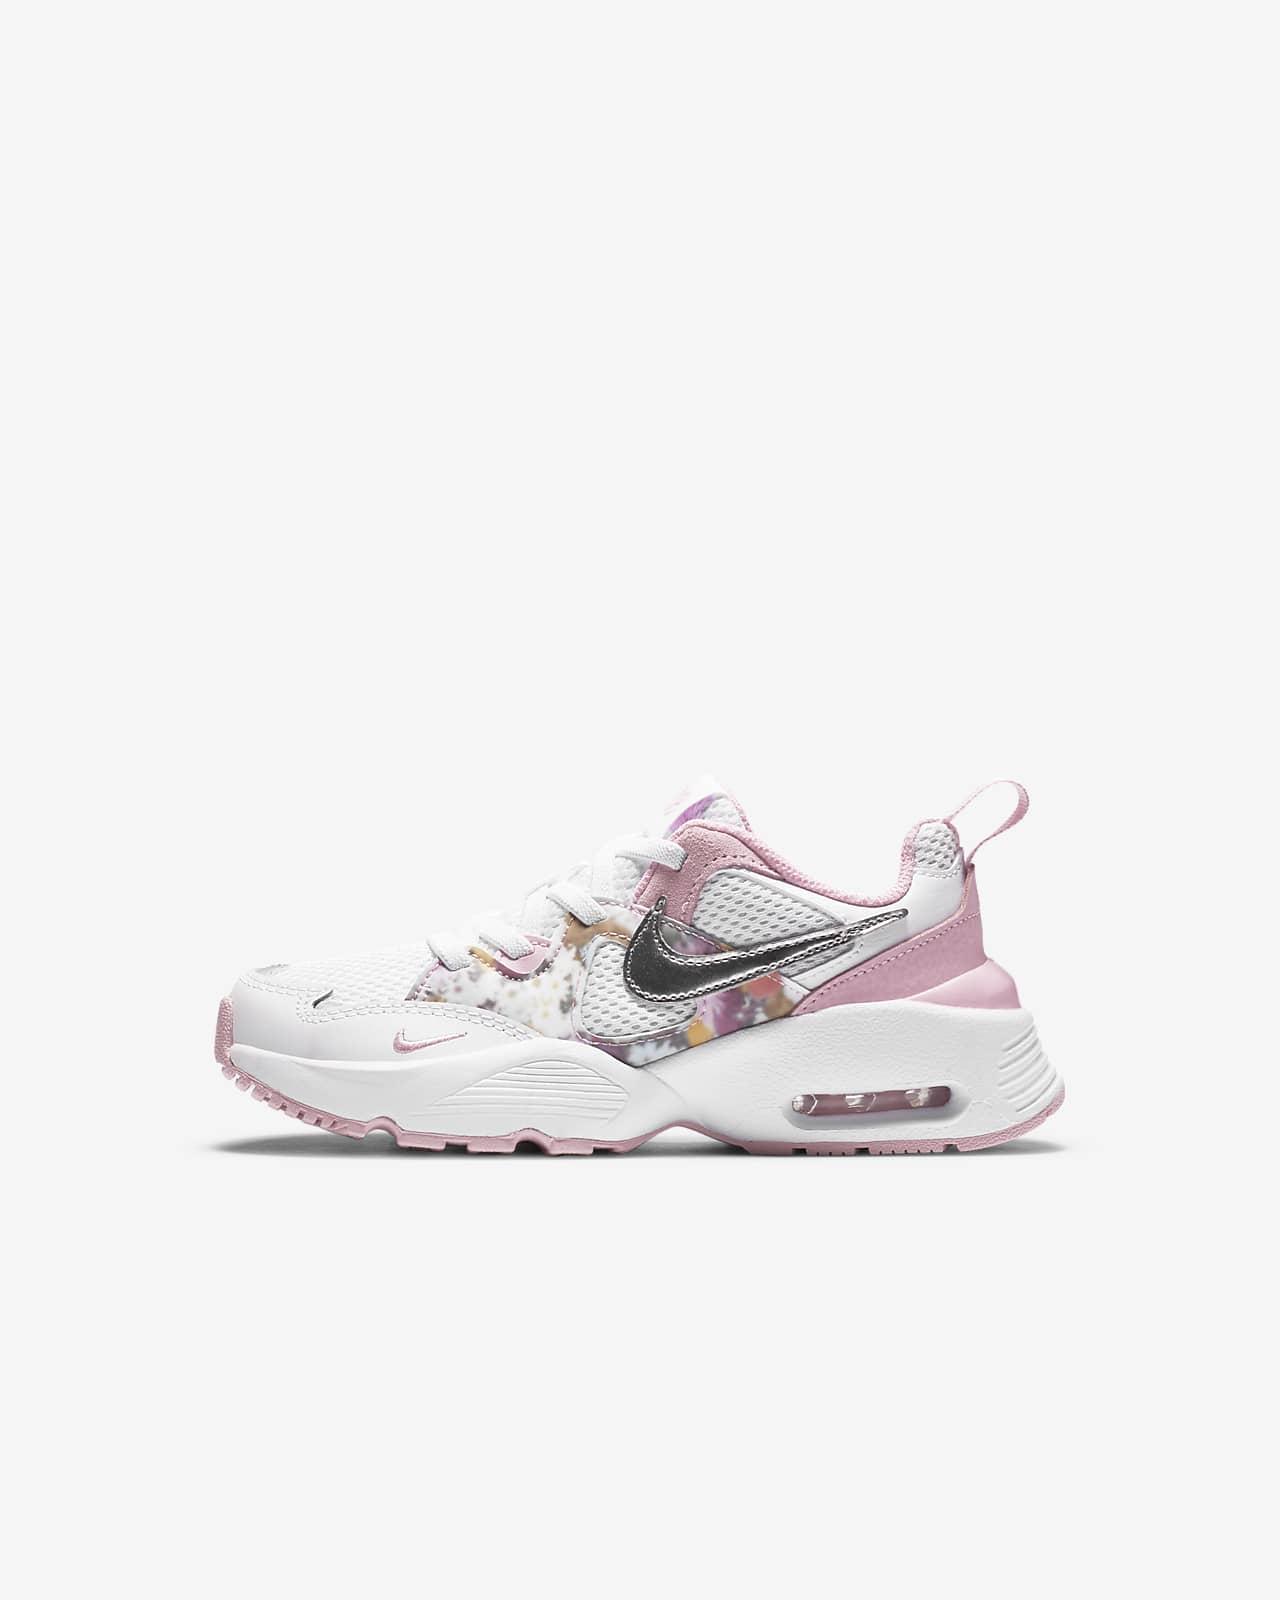 Nike Air Max Fusion SE Küçük Çocuk Ayakkabısı